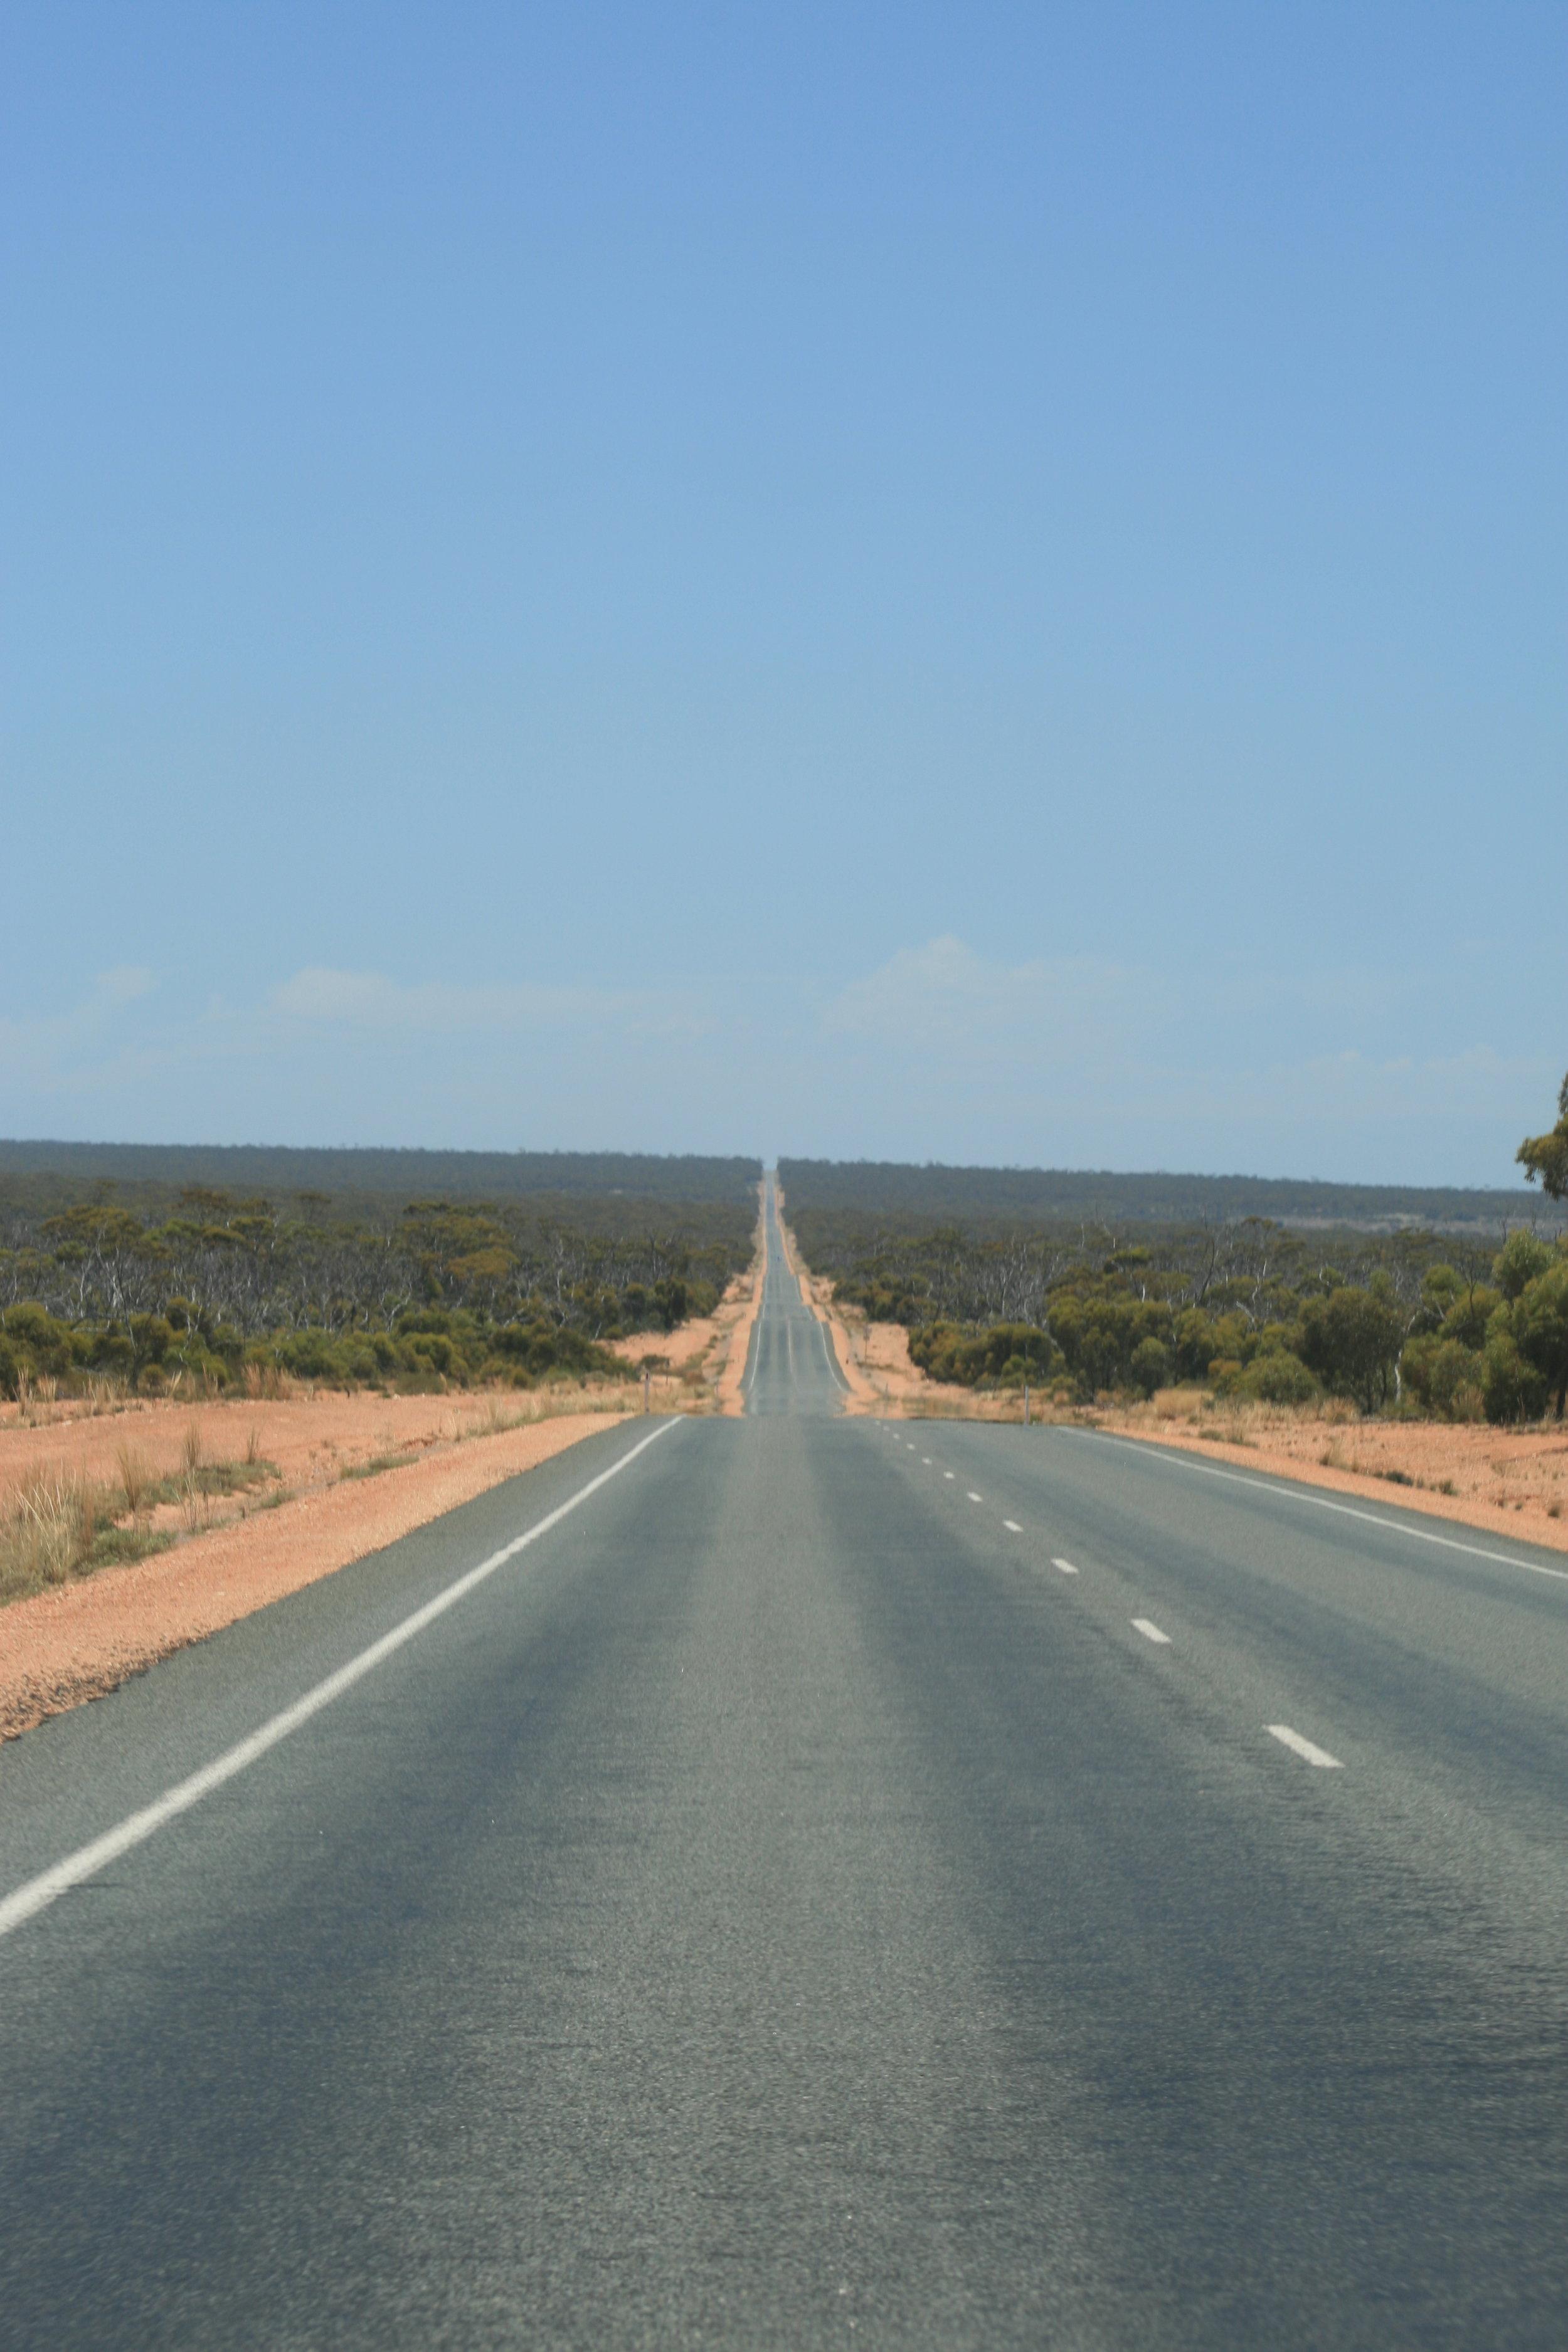 p160:2 Long road.jpg